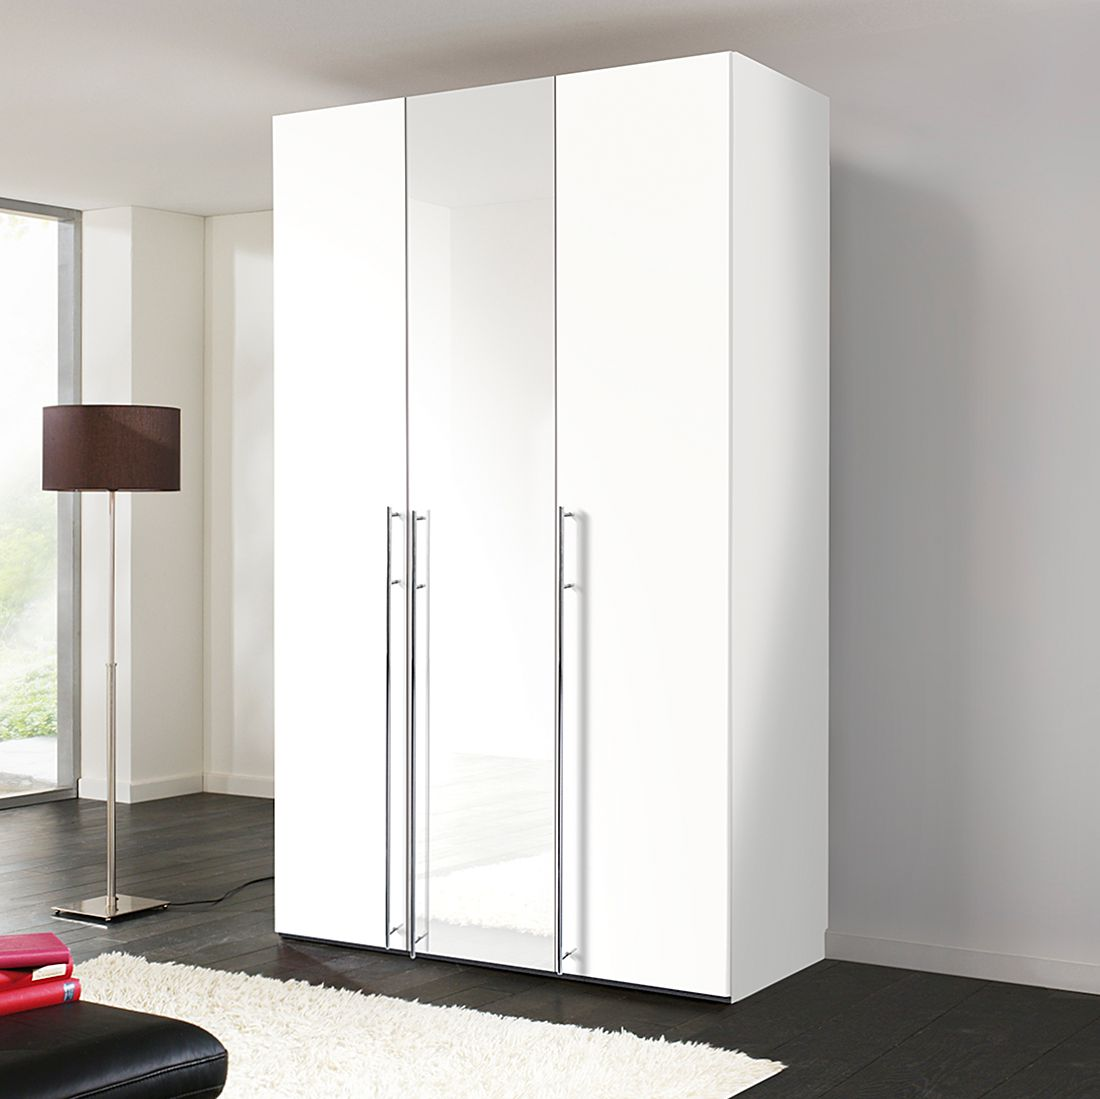 Armoire à portes battantes Brooklyn III - Blanc polaire / Blanc verni - 100 cm (2 portes) - 216 cm,